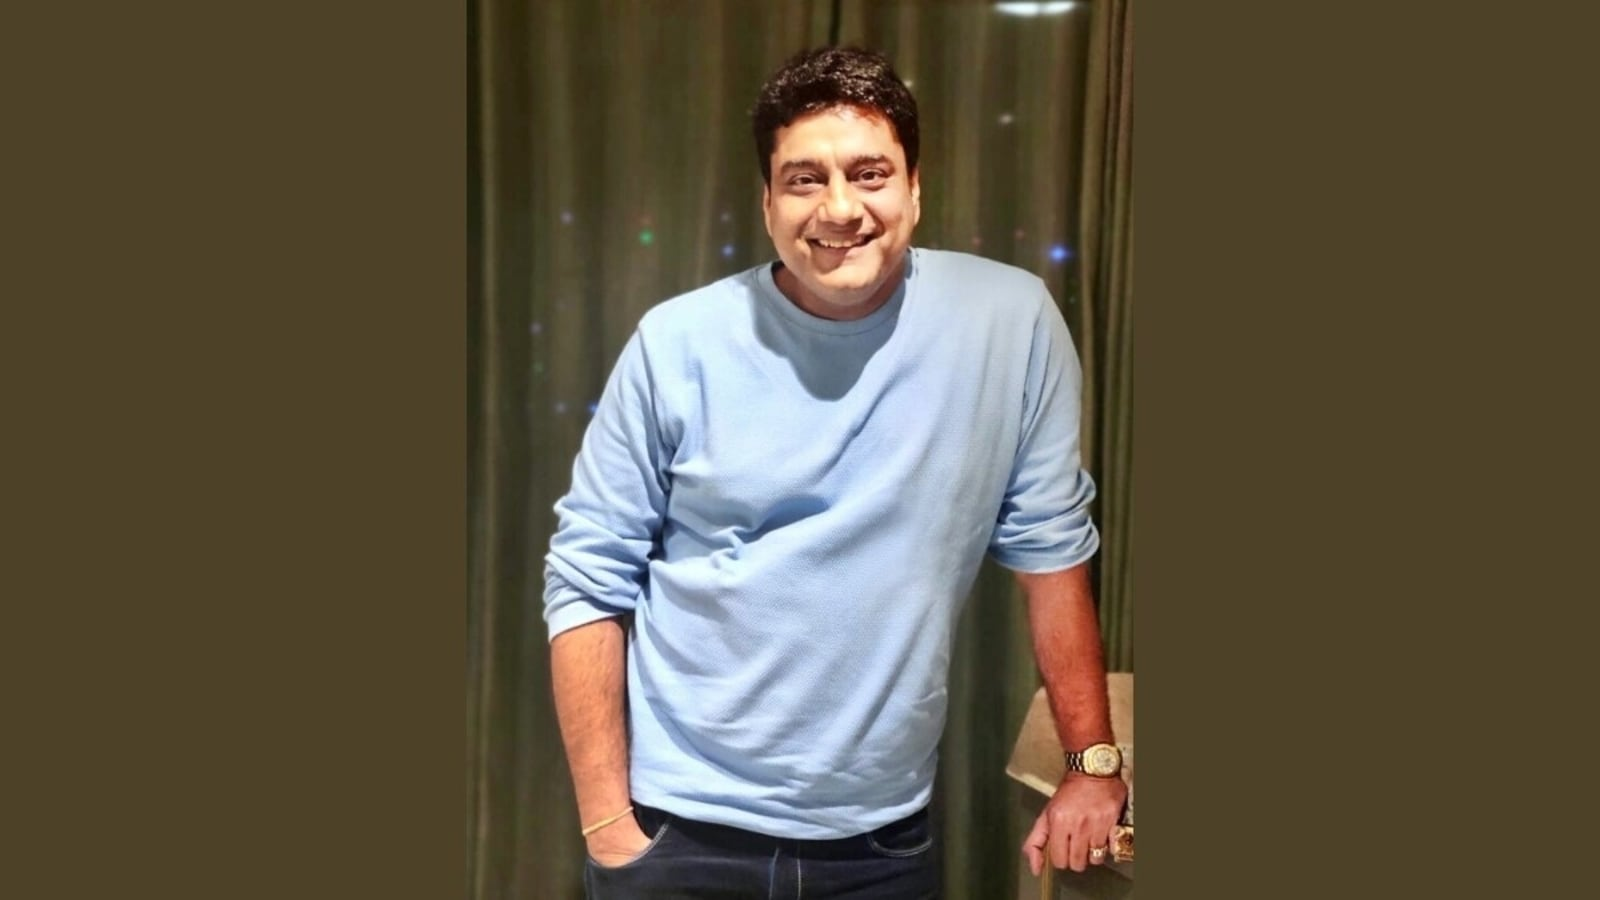 hindustantimes.com - Brand Post - At Crystal Logic Pvt Ltd, Manoj Punjabi & team are redefining digital marketing